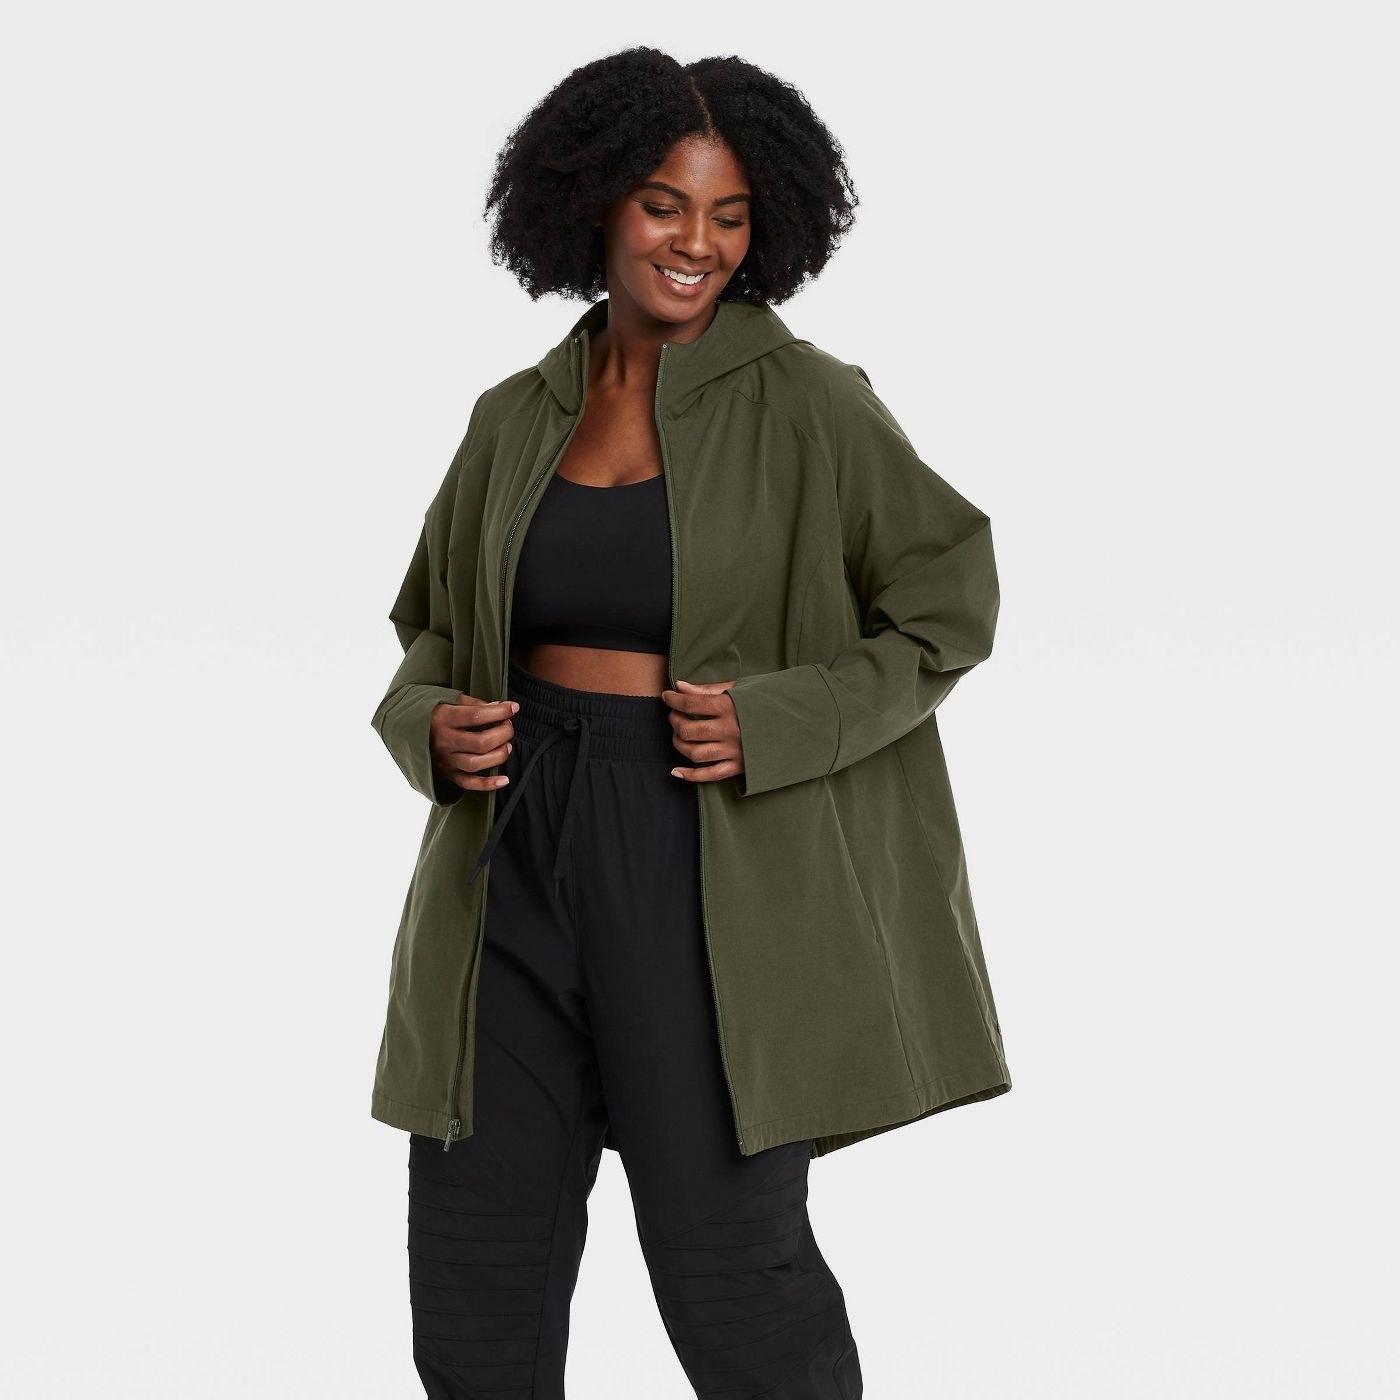 Model in green anorak jacket